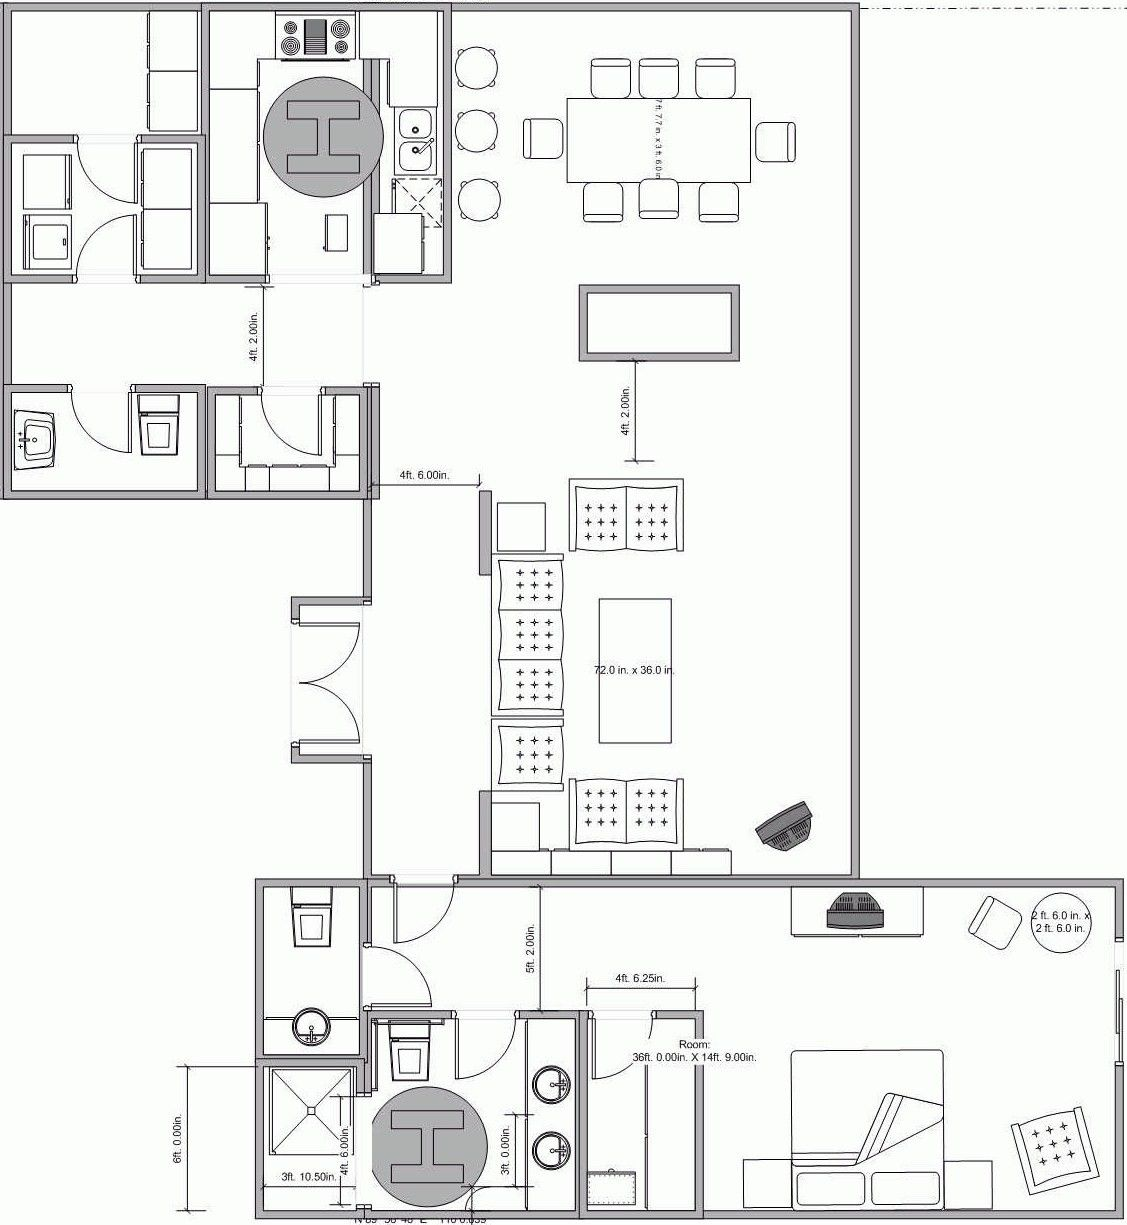 Loreto, Baja California Sur (BCS), Mexico: New draft of ... on w shaped house plans, v shaped house plans, t shaped house plans, l shaped house plans, s shaped house plans, u shaped house plans,